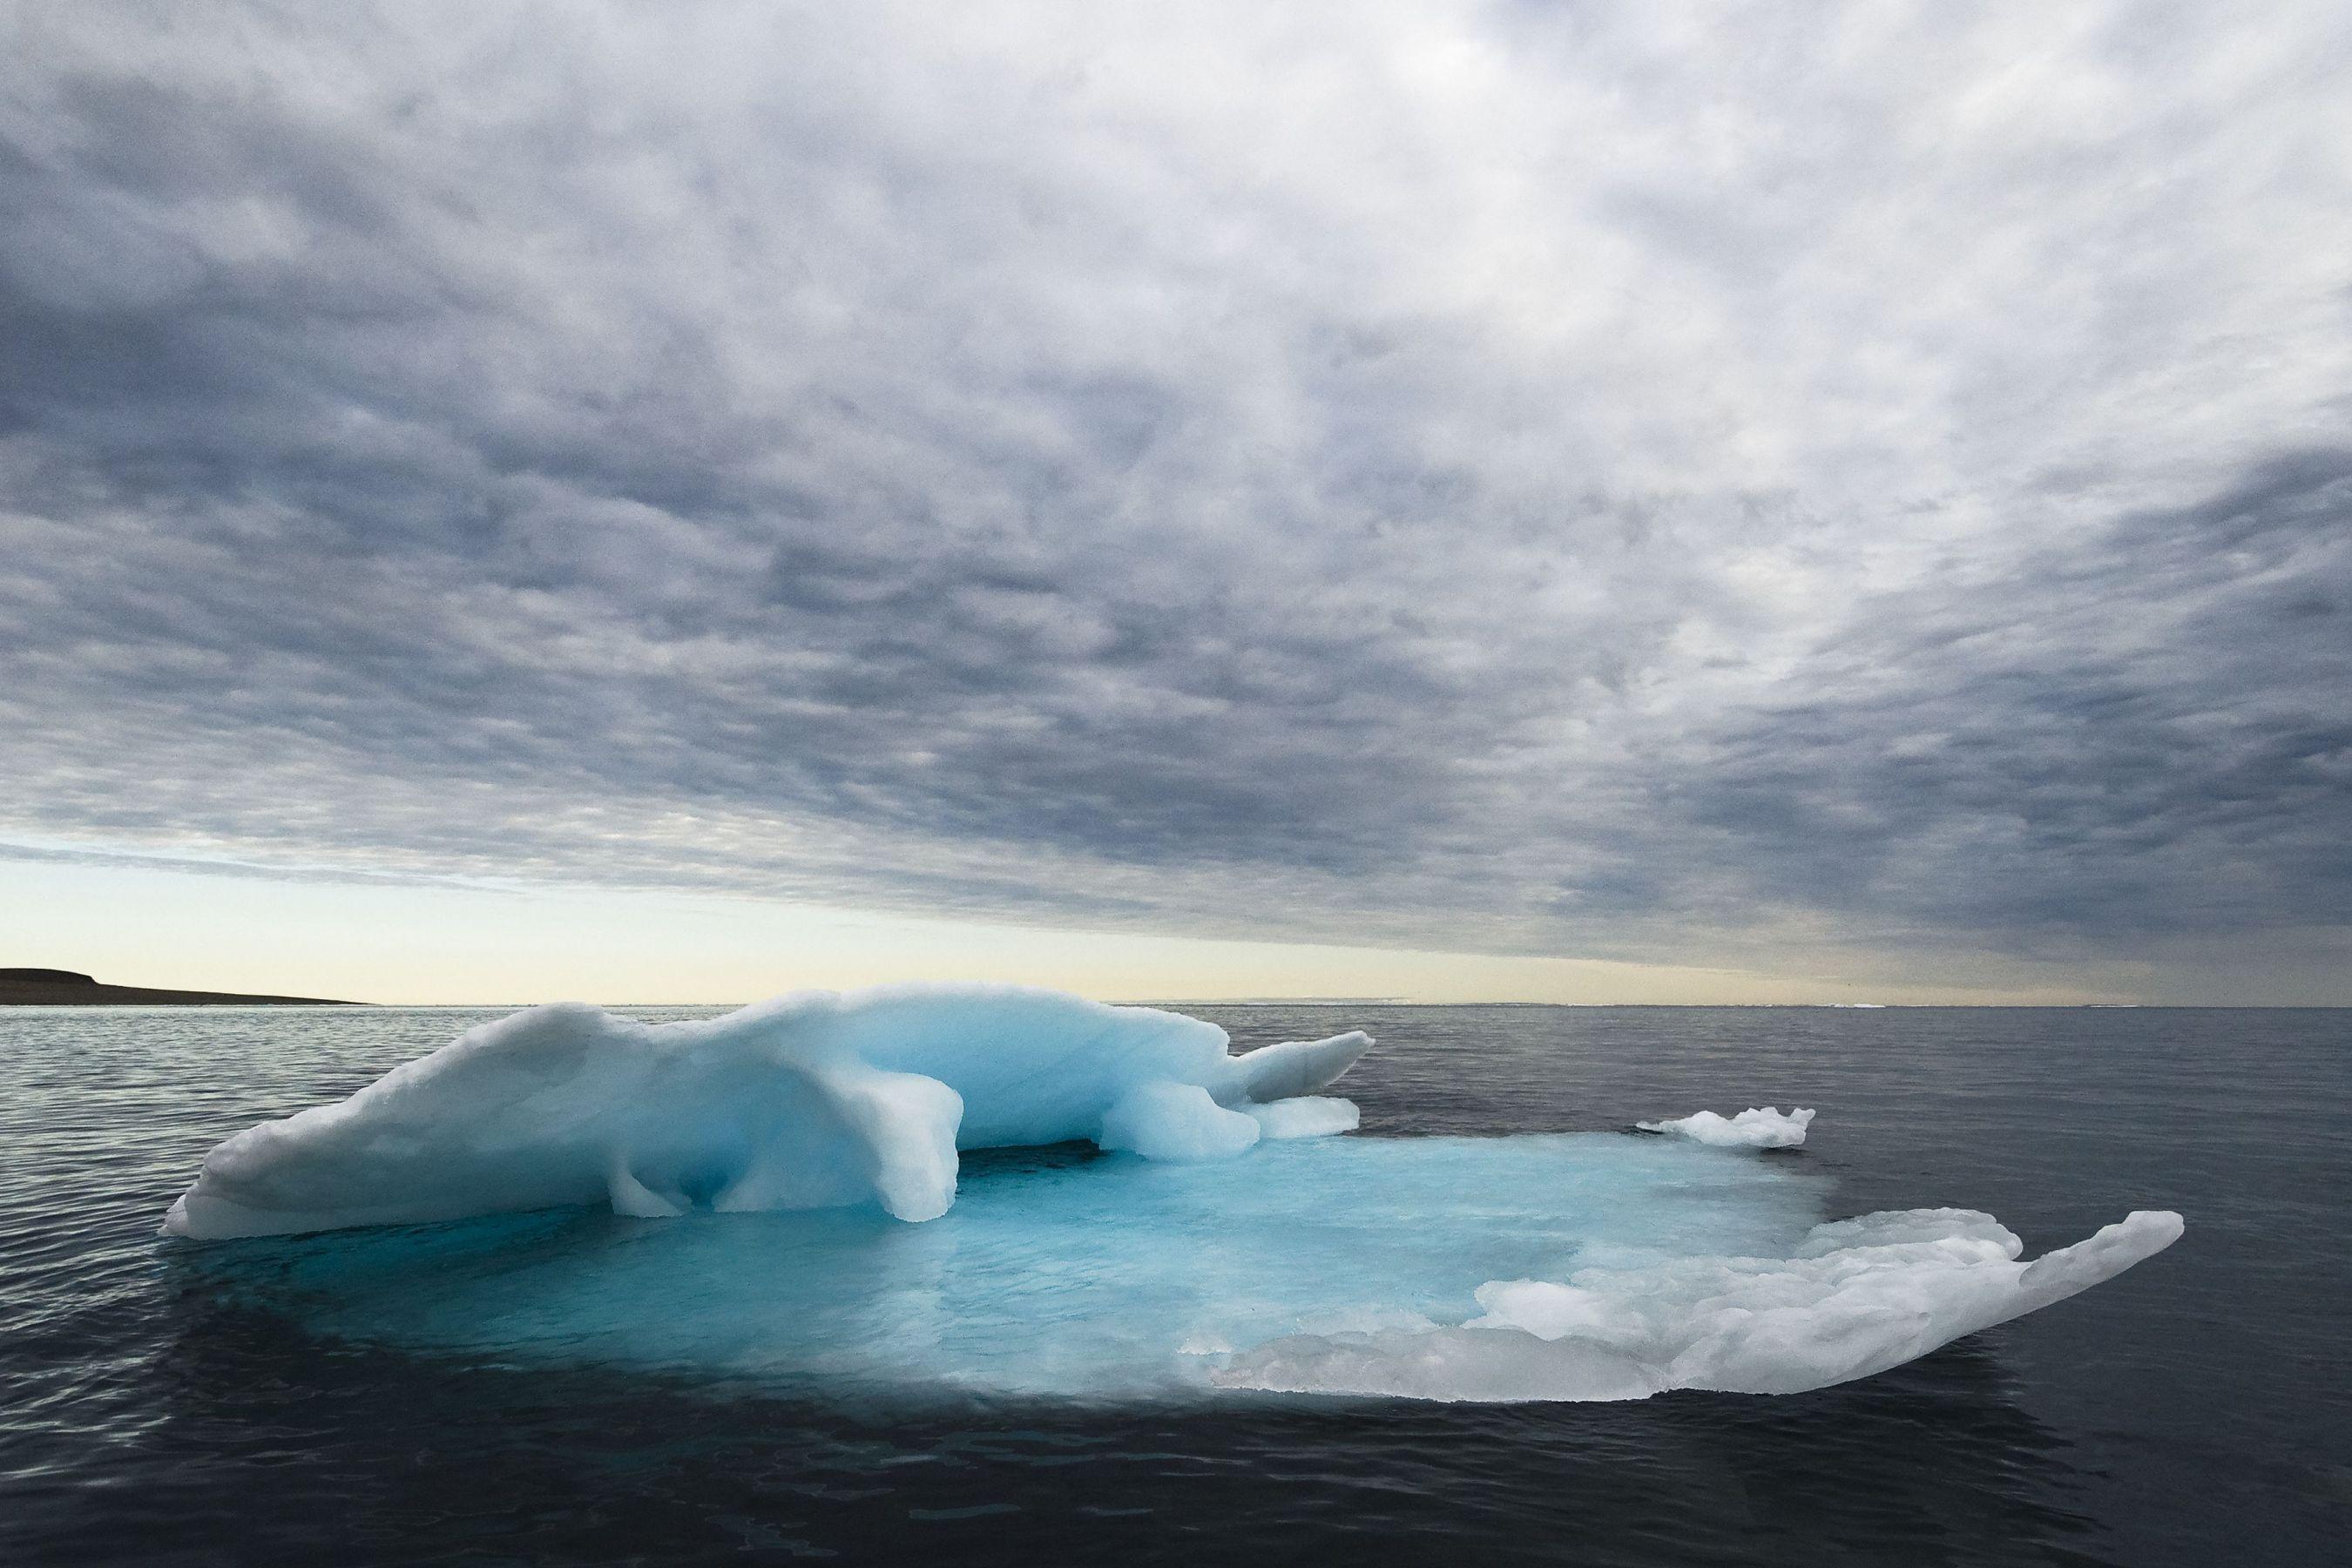 ©: Andrew S. Wright / WWF-Canada